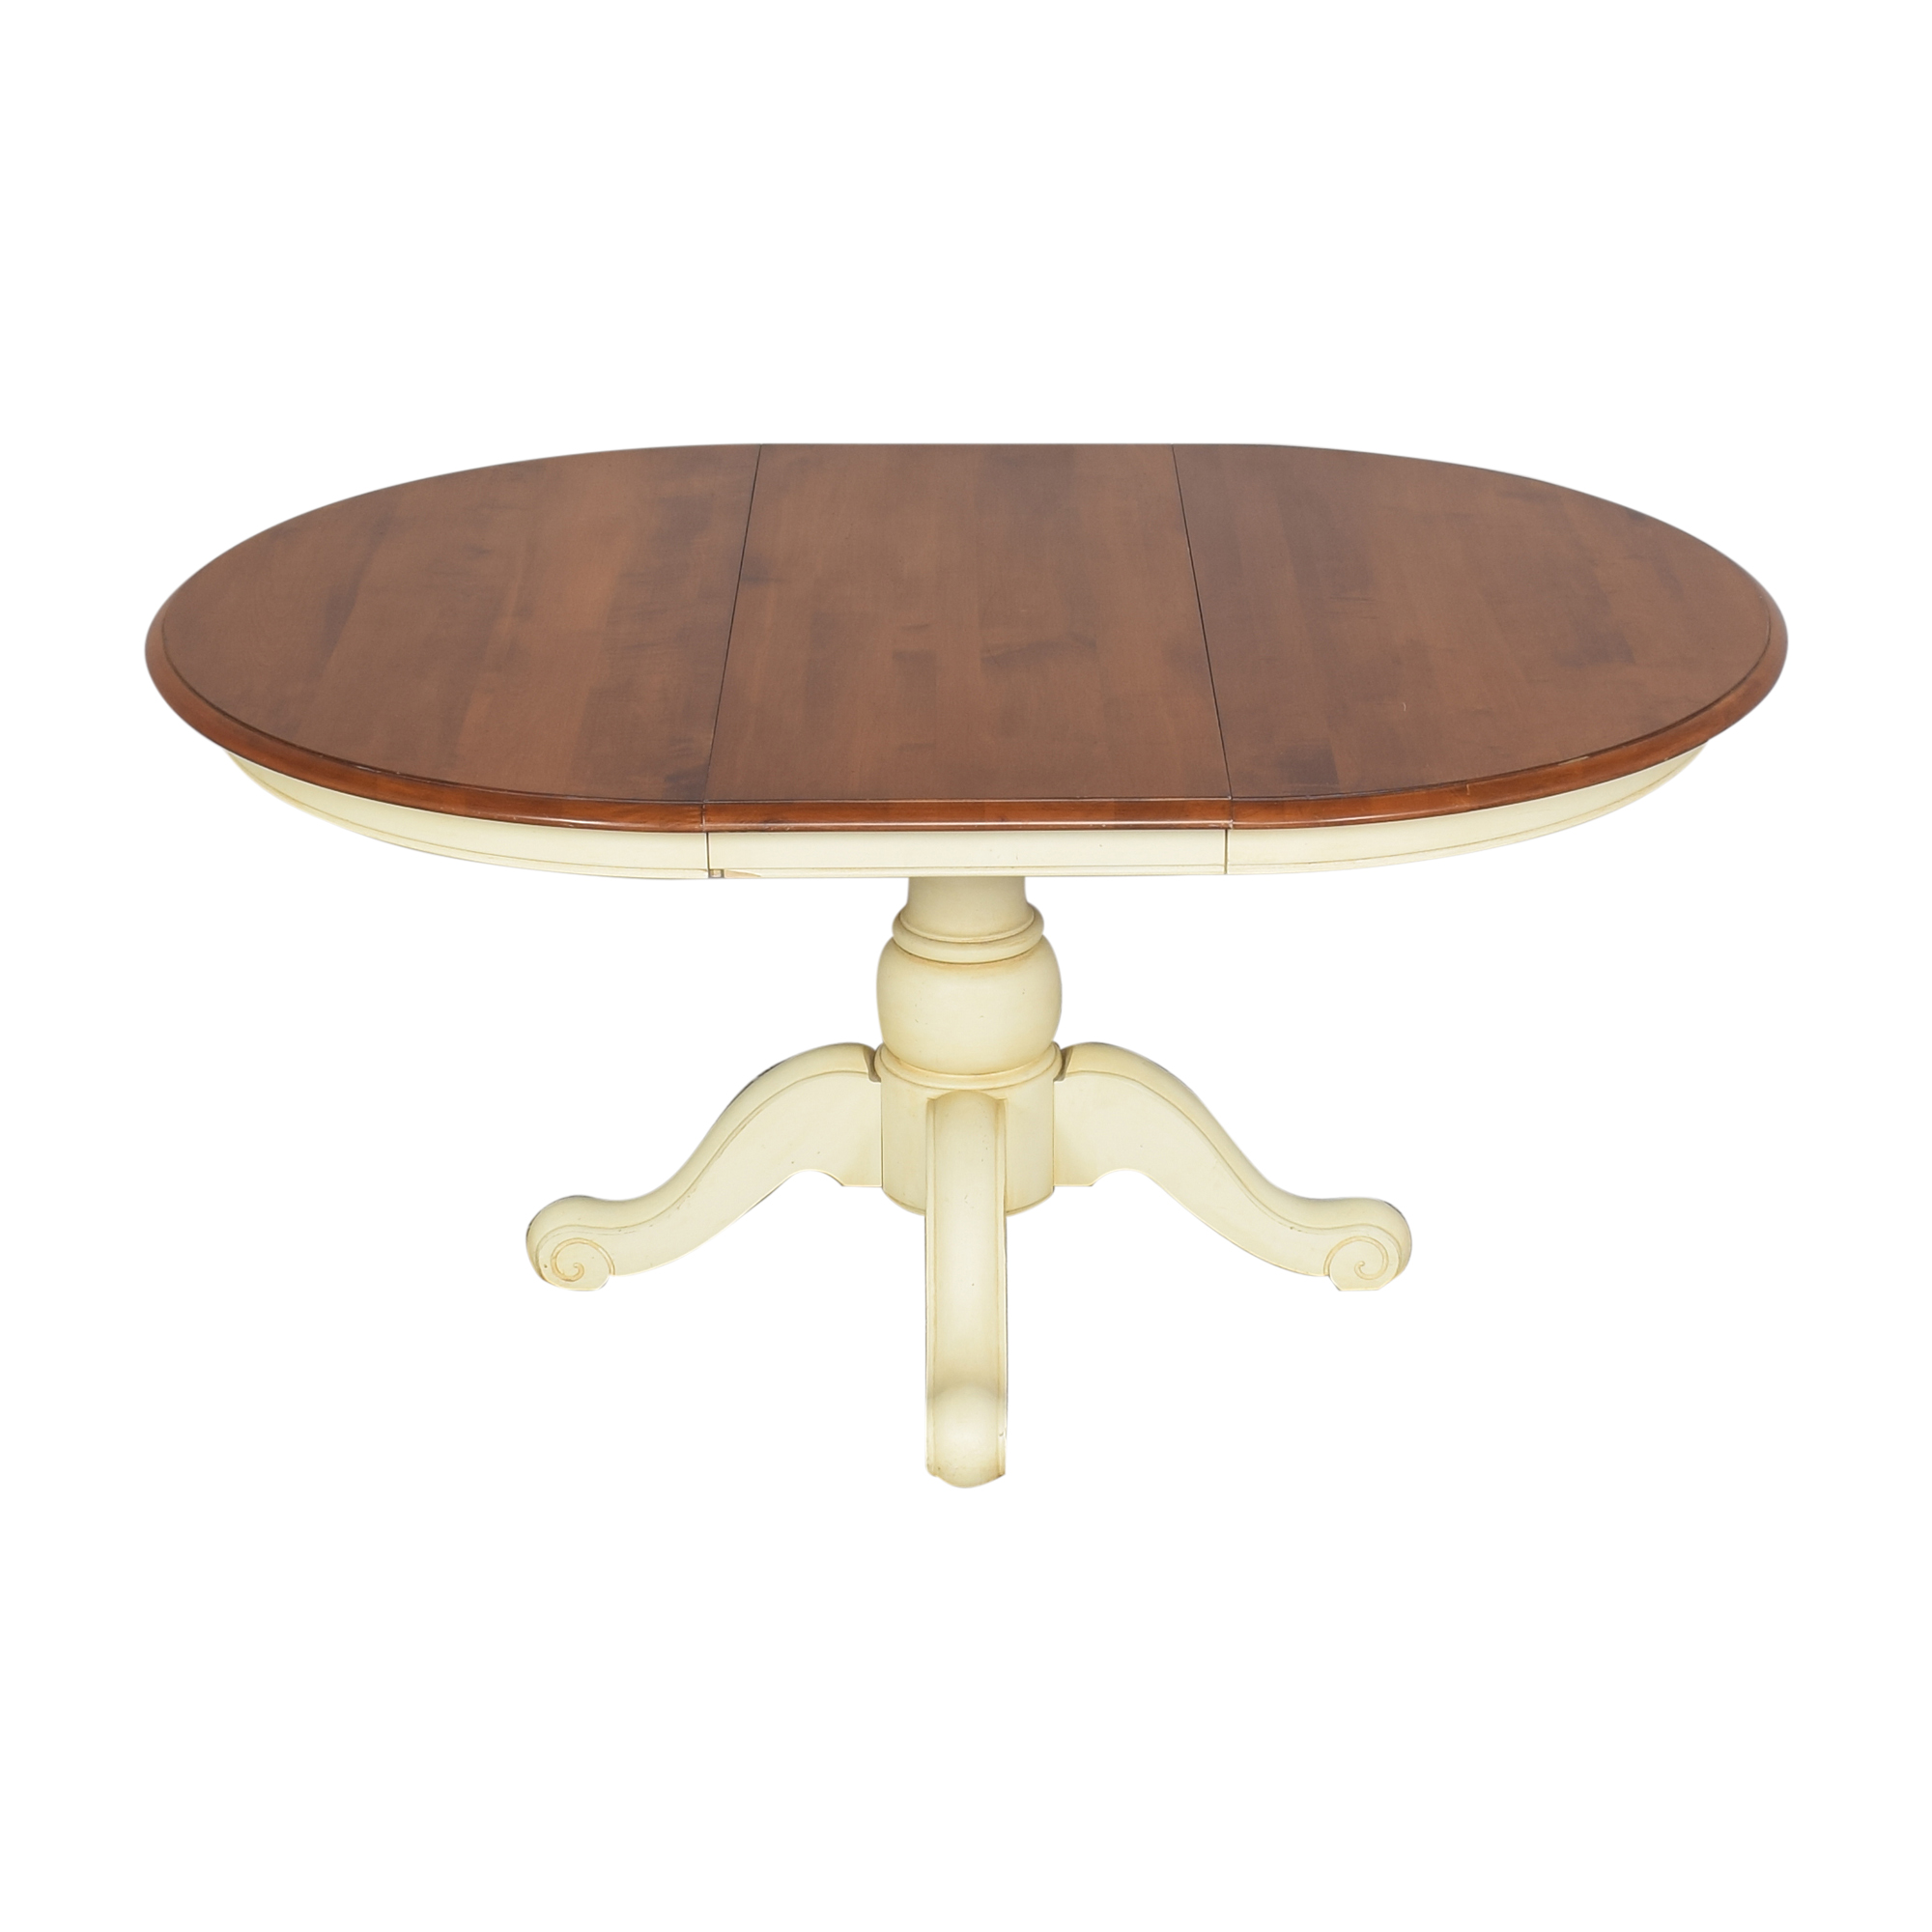 Ethan Allen Ethan Allen Extendable Farmhouse Dining Table for sale